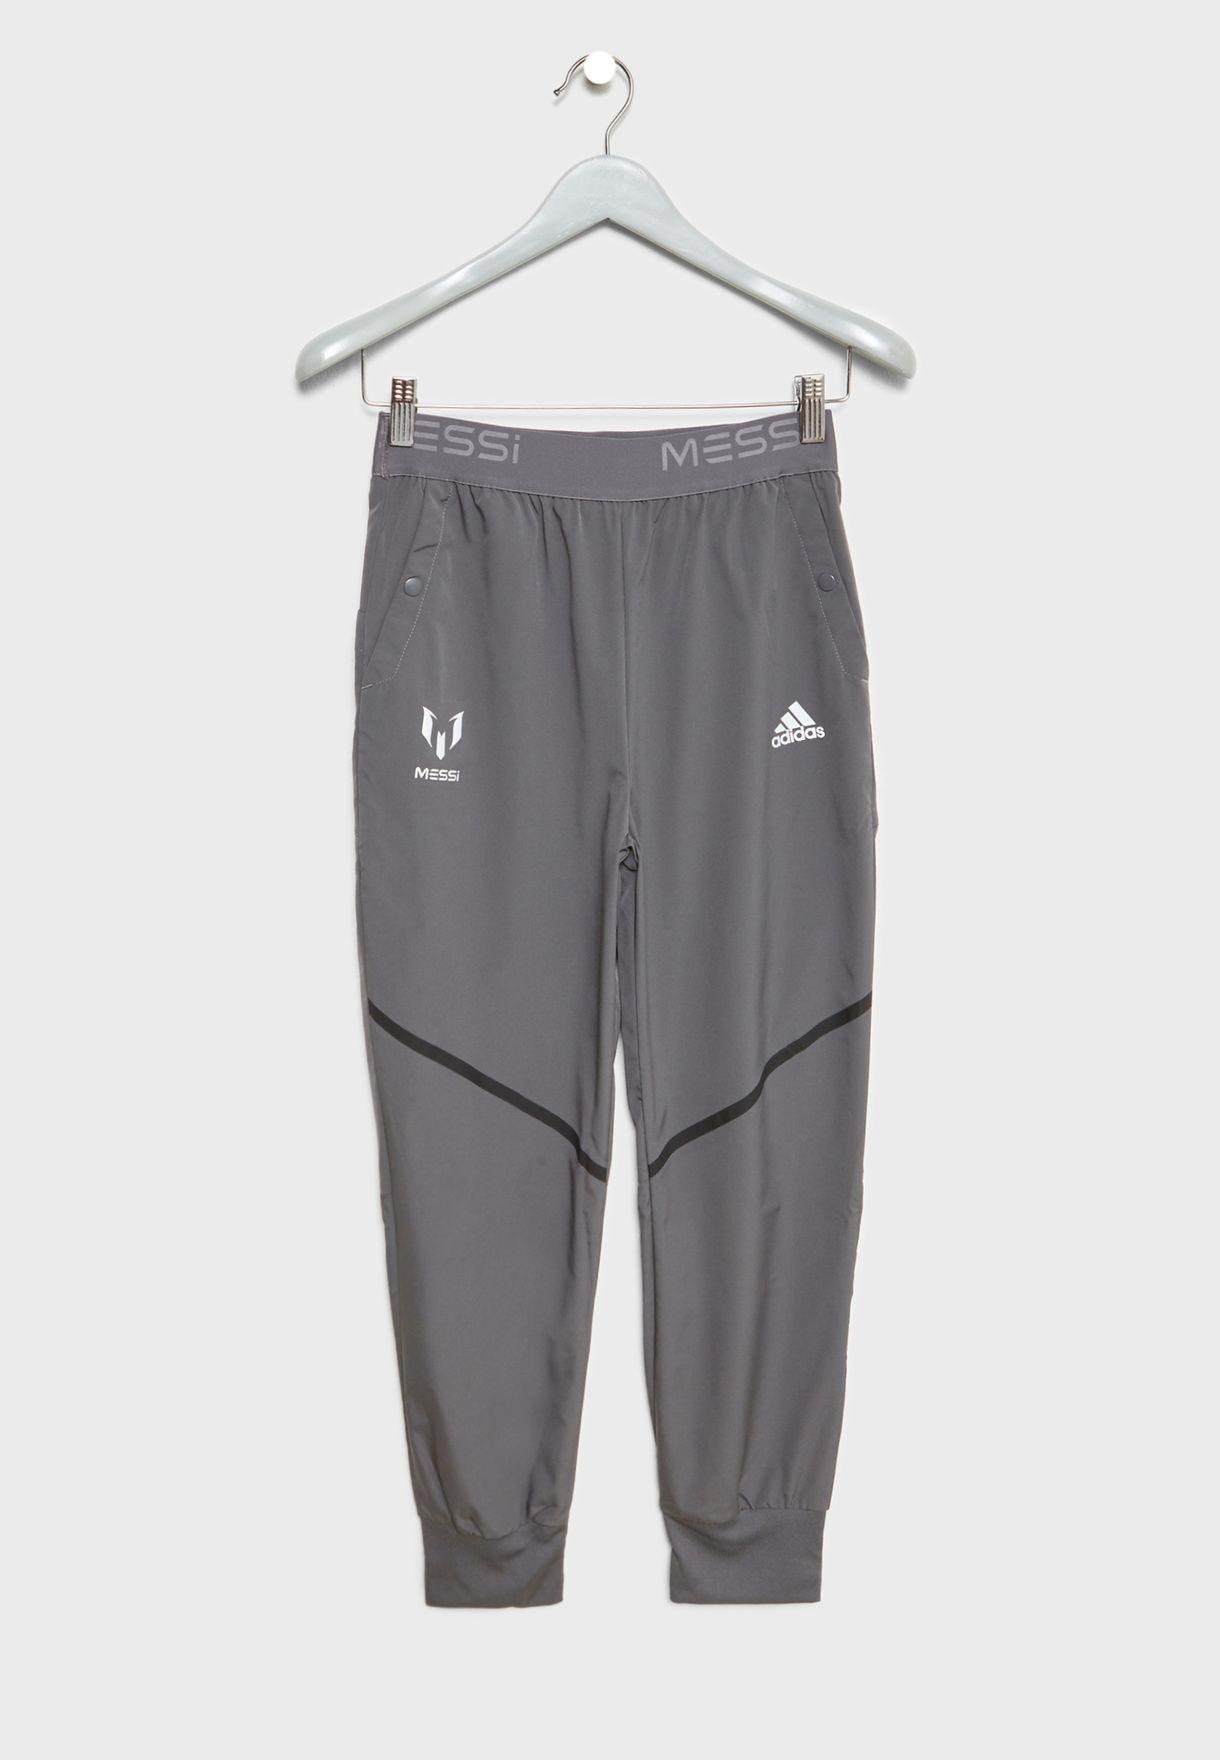 Youth Messi Sweatpants